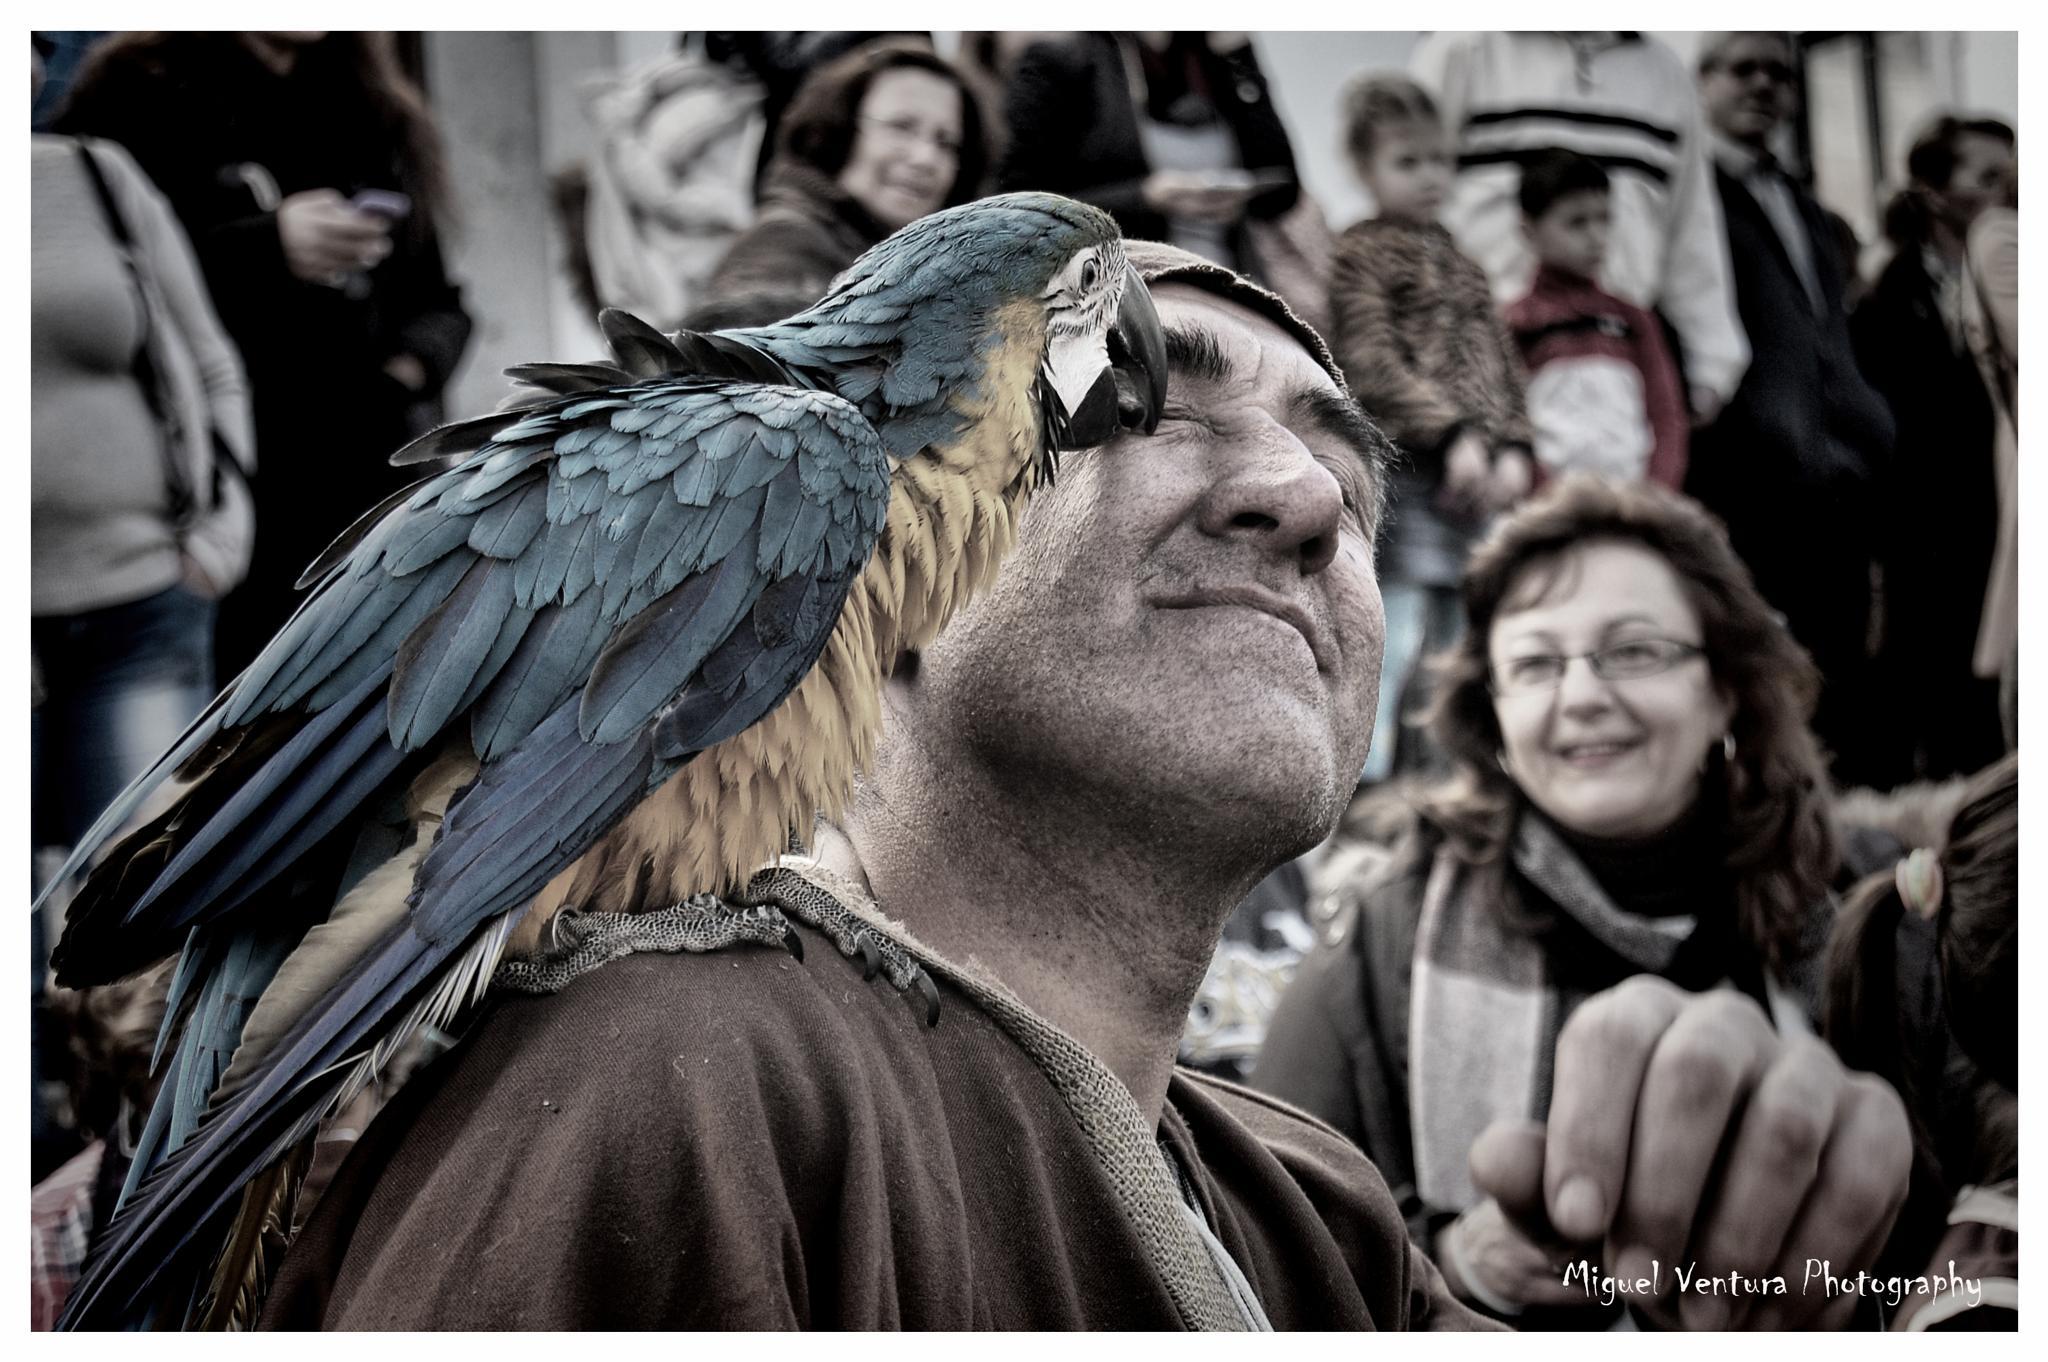 Medievel Festival@Paderne/Albufeira - Algarve by MiguelVentura